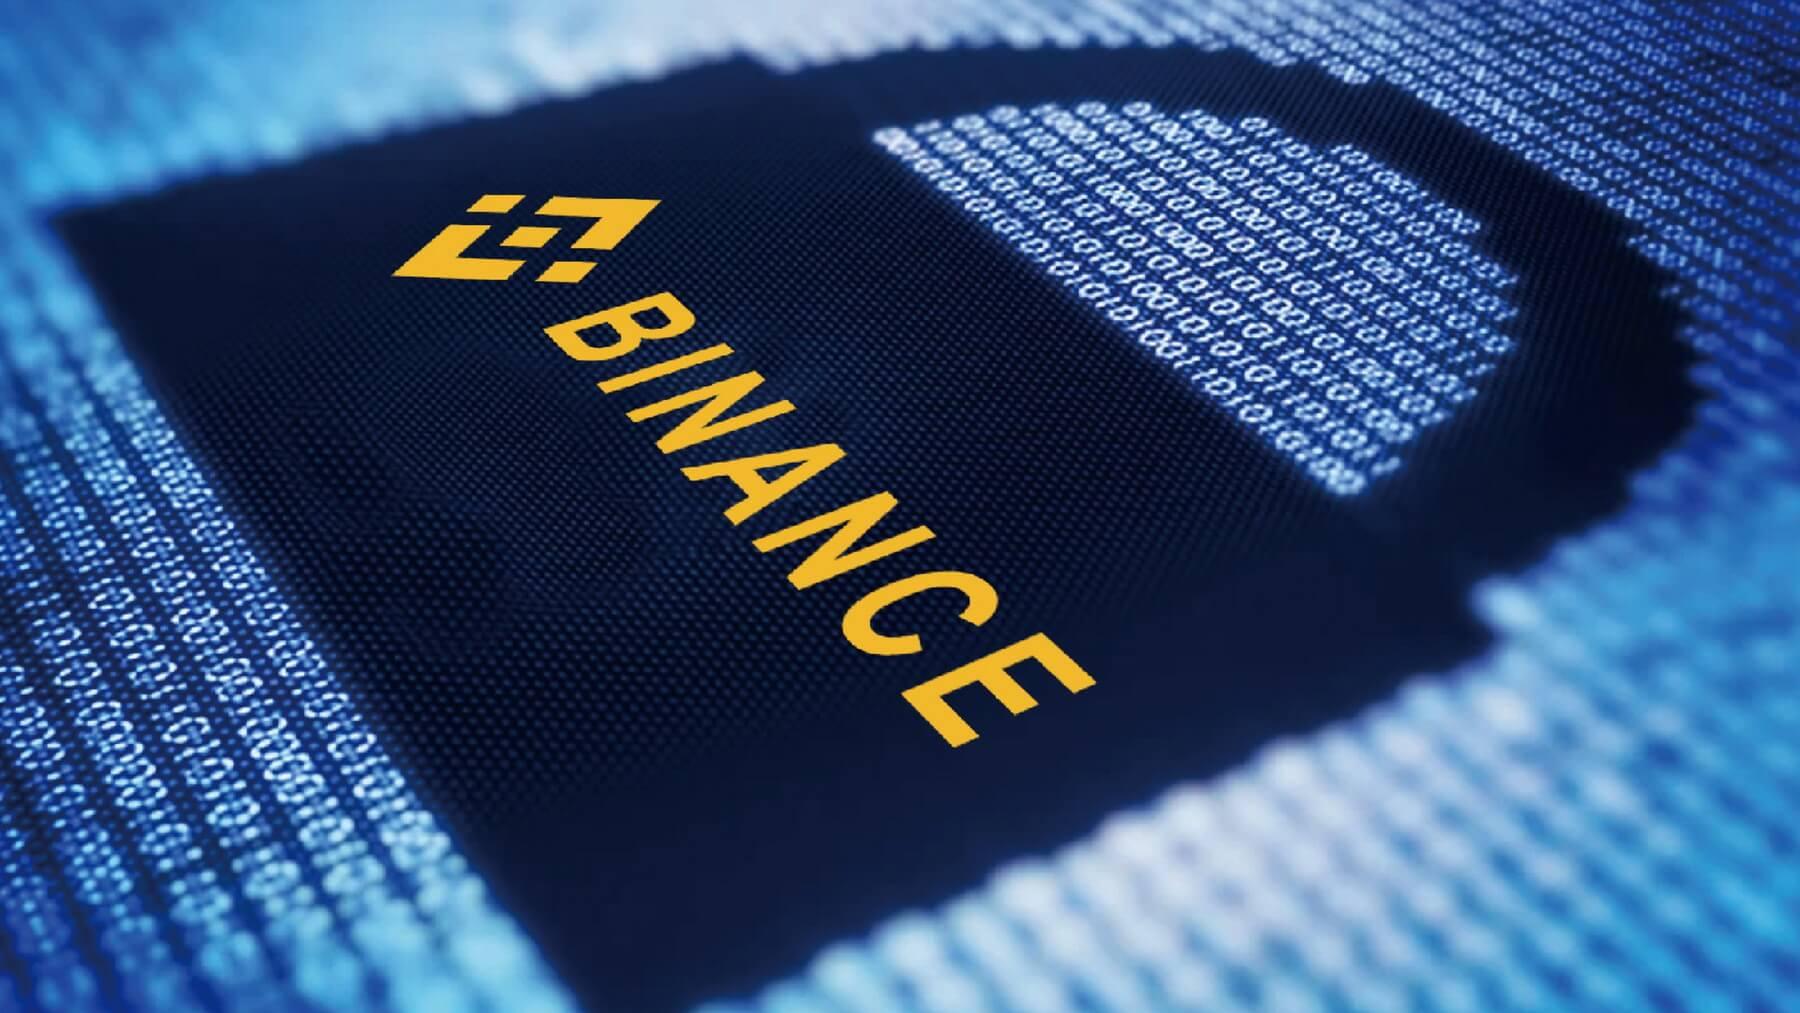 Binance атакована конкурентами, — генеральный директор биржи